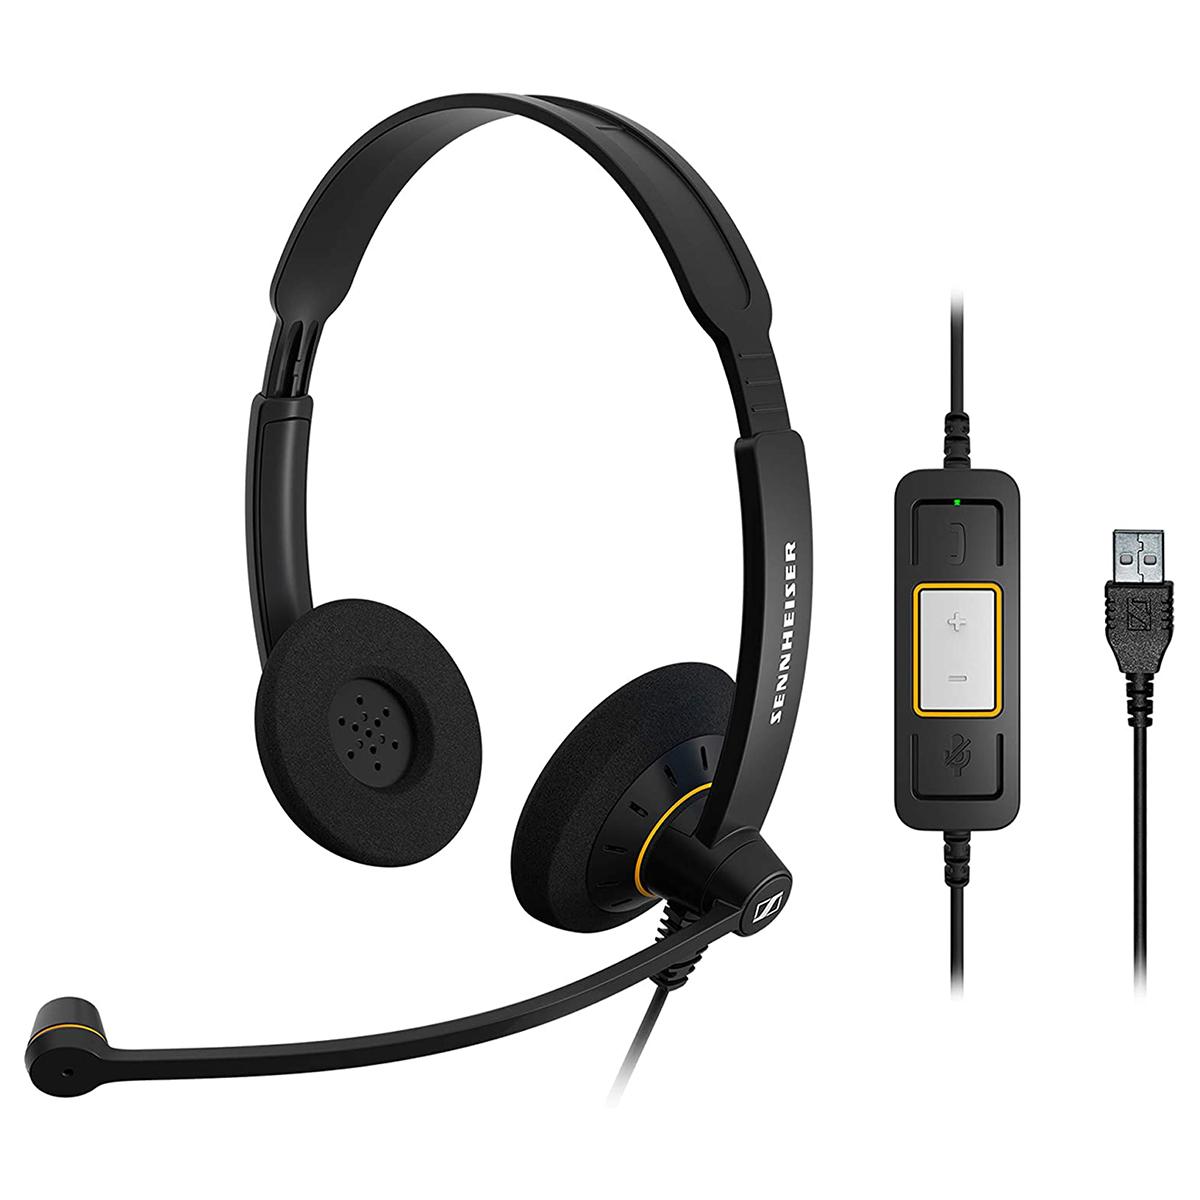 EPOS Sennheiser SC60 Usb Ml Bin MS Lync Headset